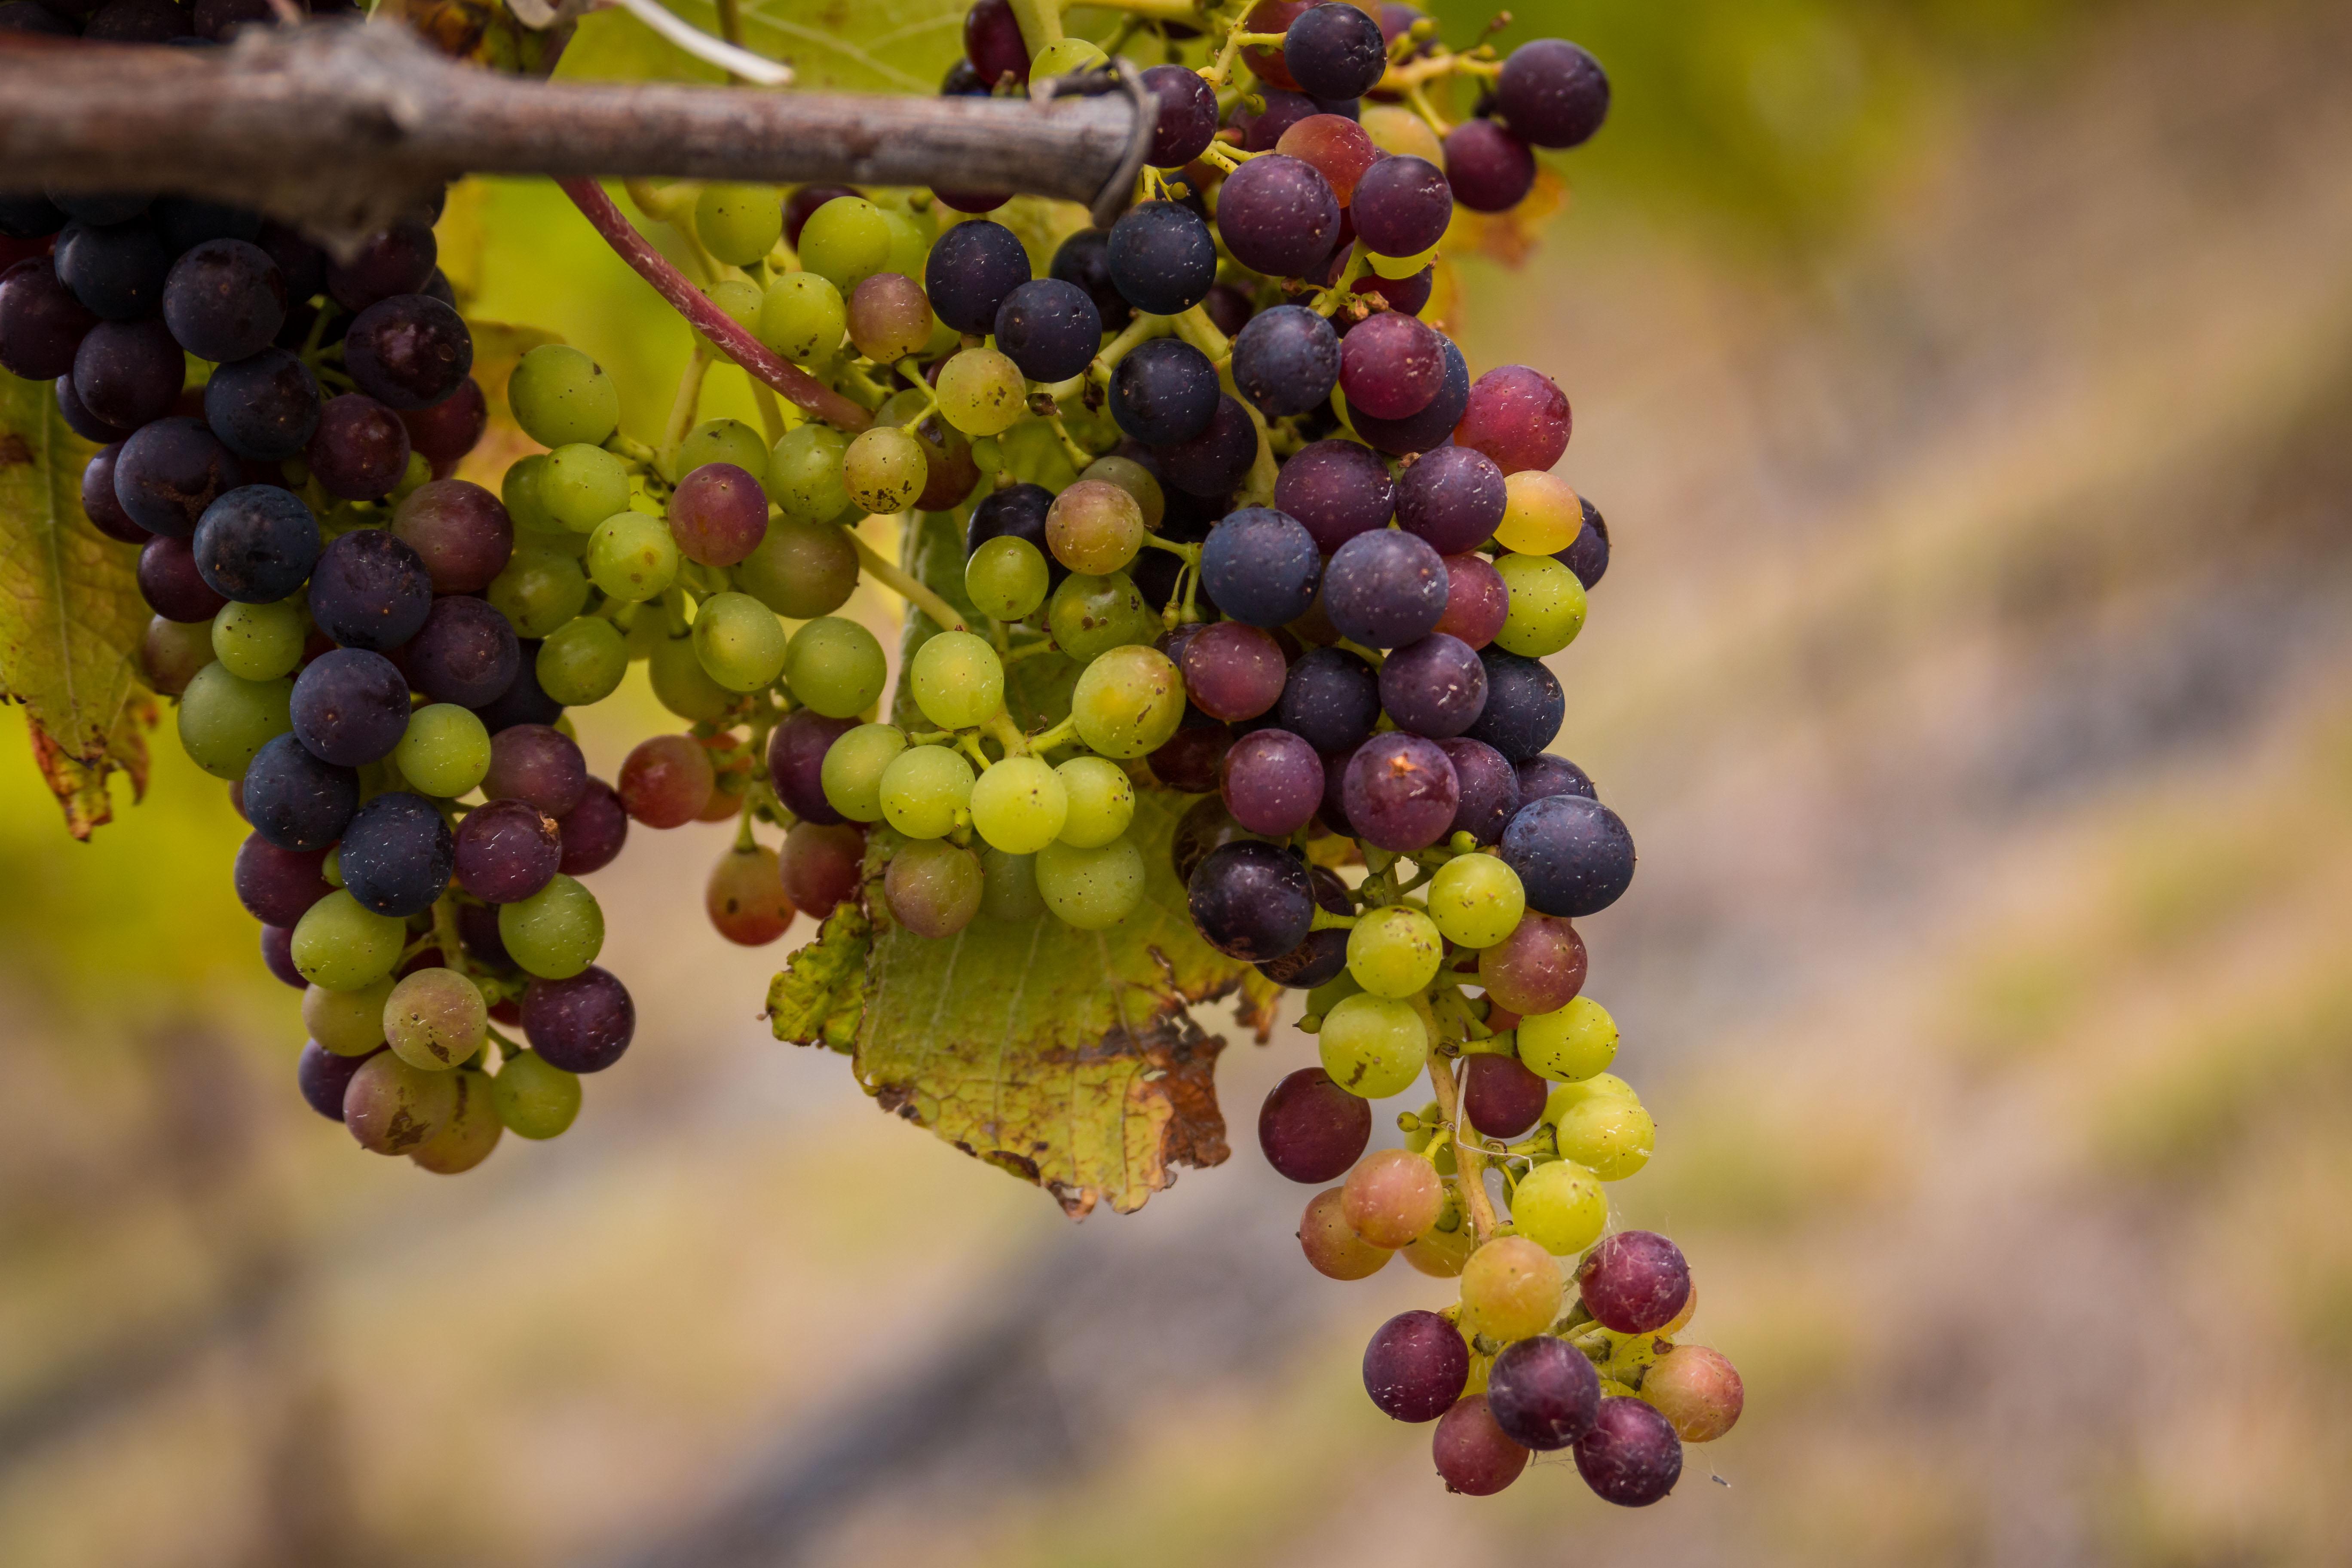 Bloomer Creek Chasing The Vine